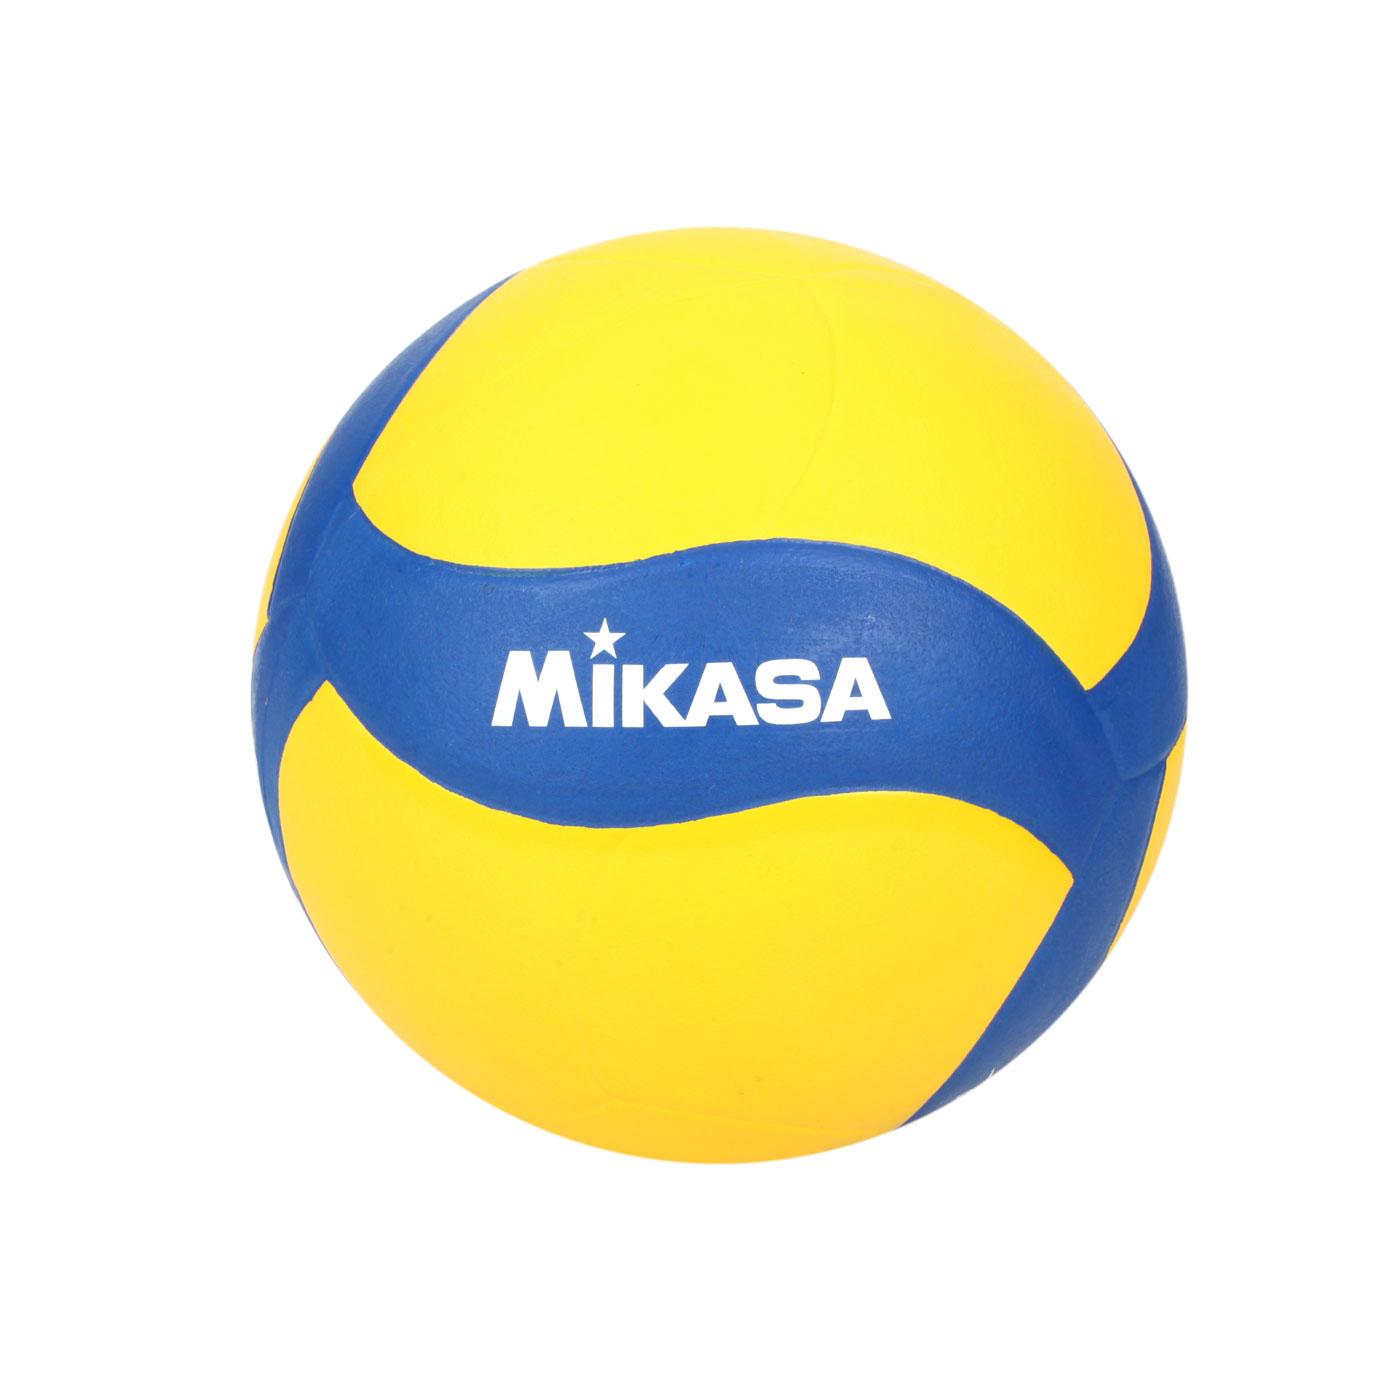 MIKASA 螺旋型軟橡膠排球#4 V024WS - 黃藍白